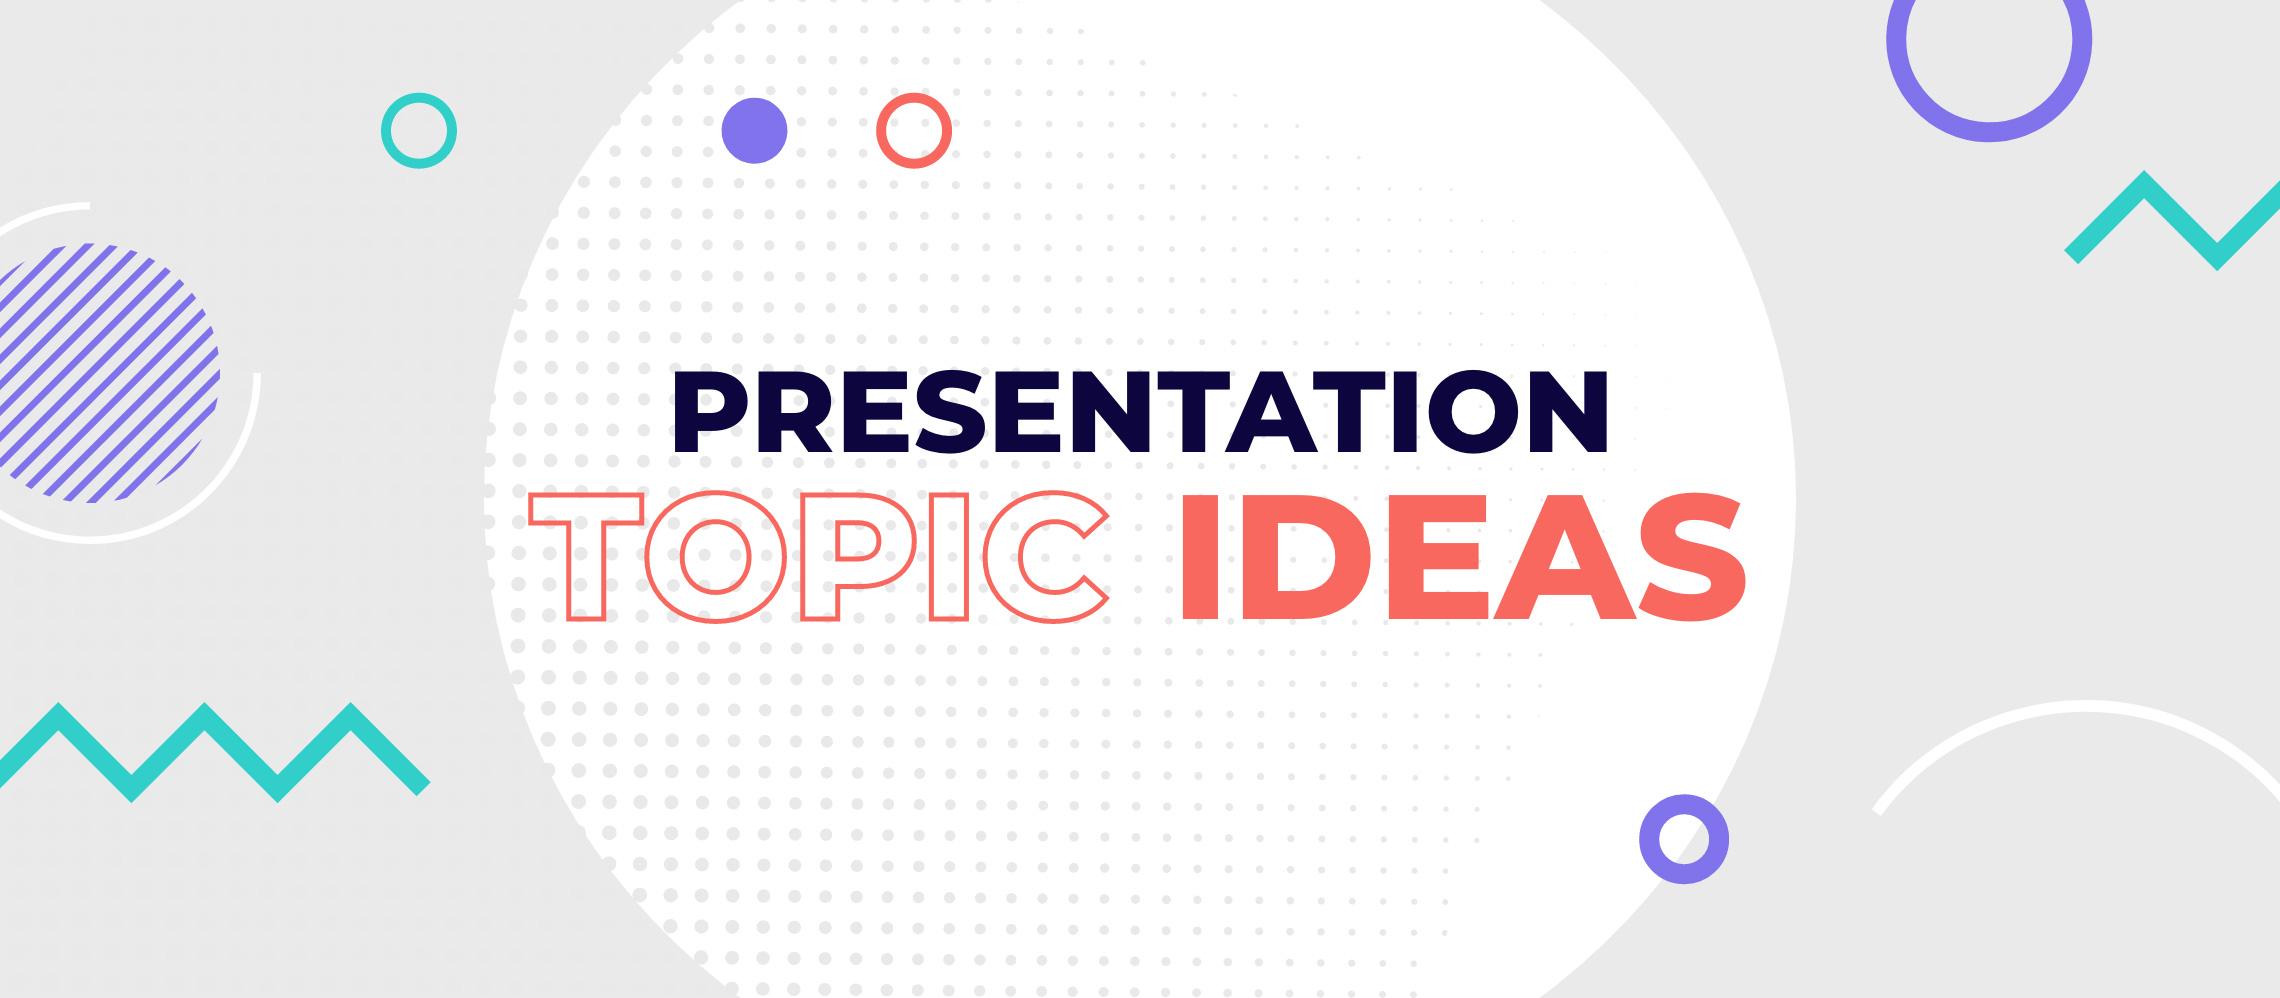 presentation topic ideas blog header